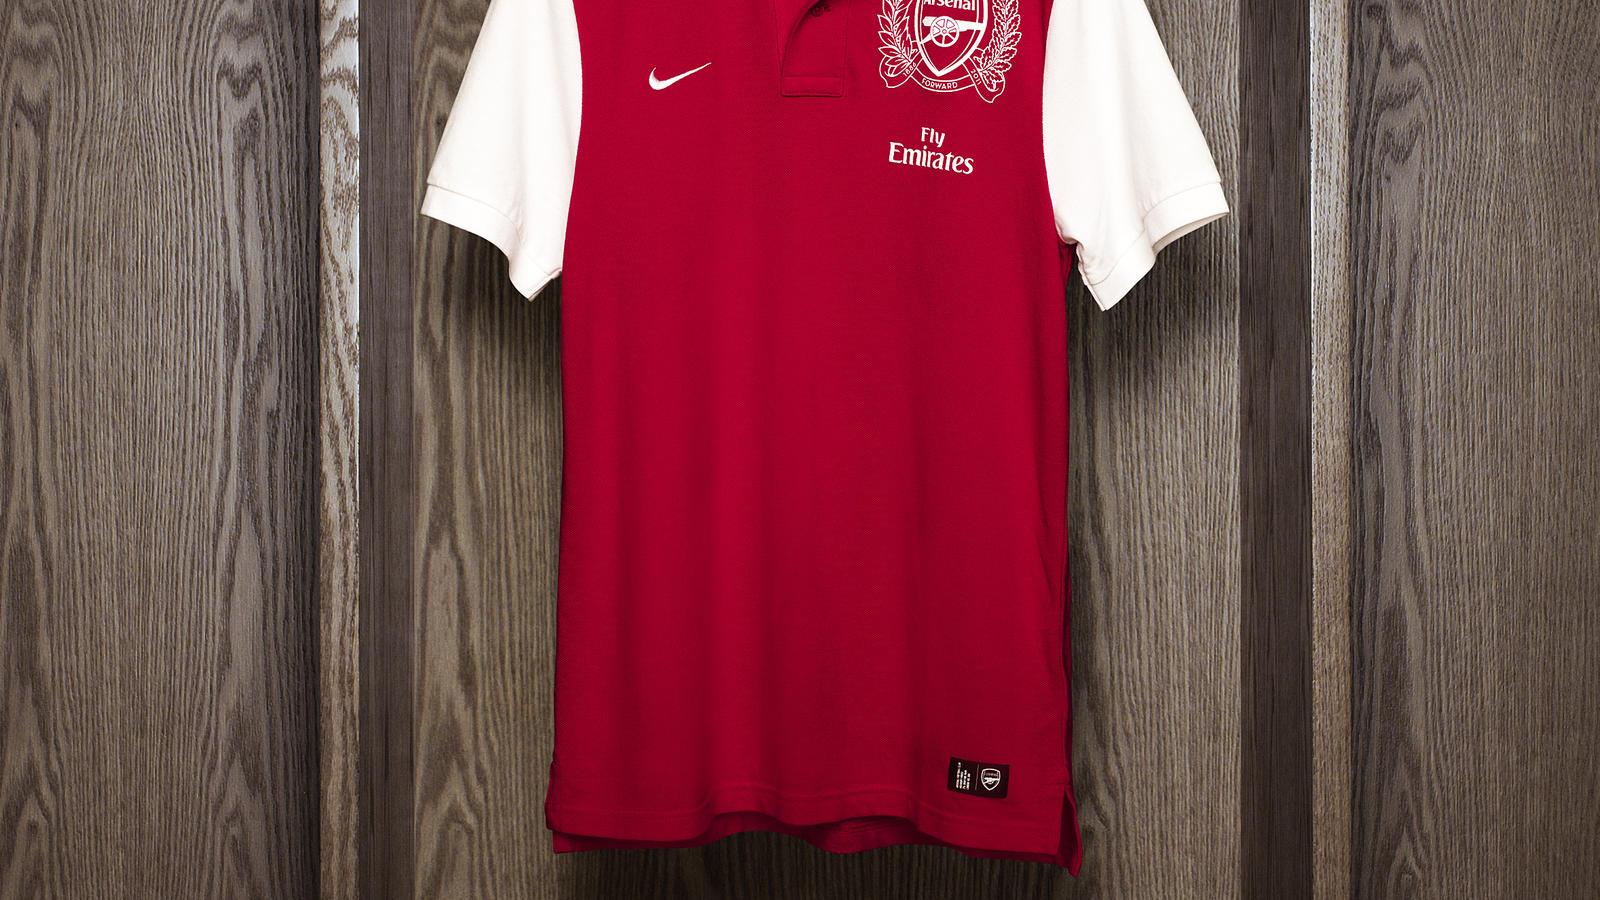 factory price cb2c7 d16ec Nike Unveils Arsenal FC 125th Anniversary Kit - Nike News